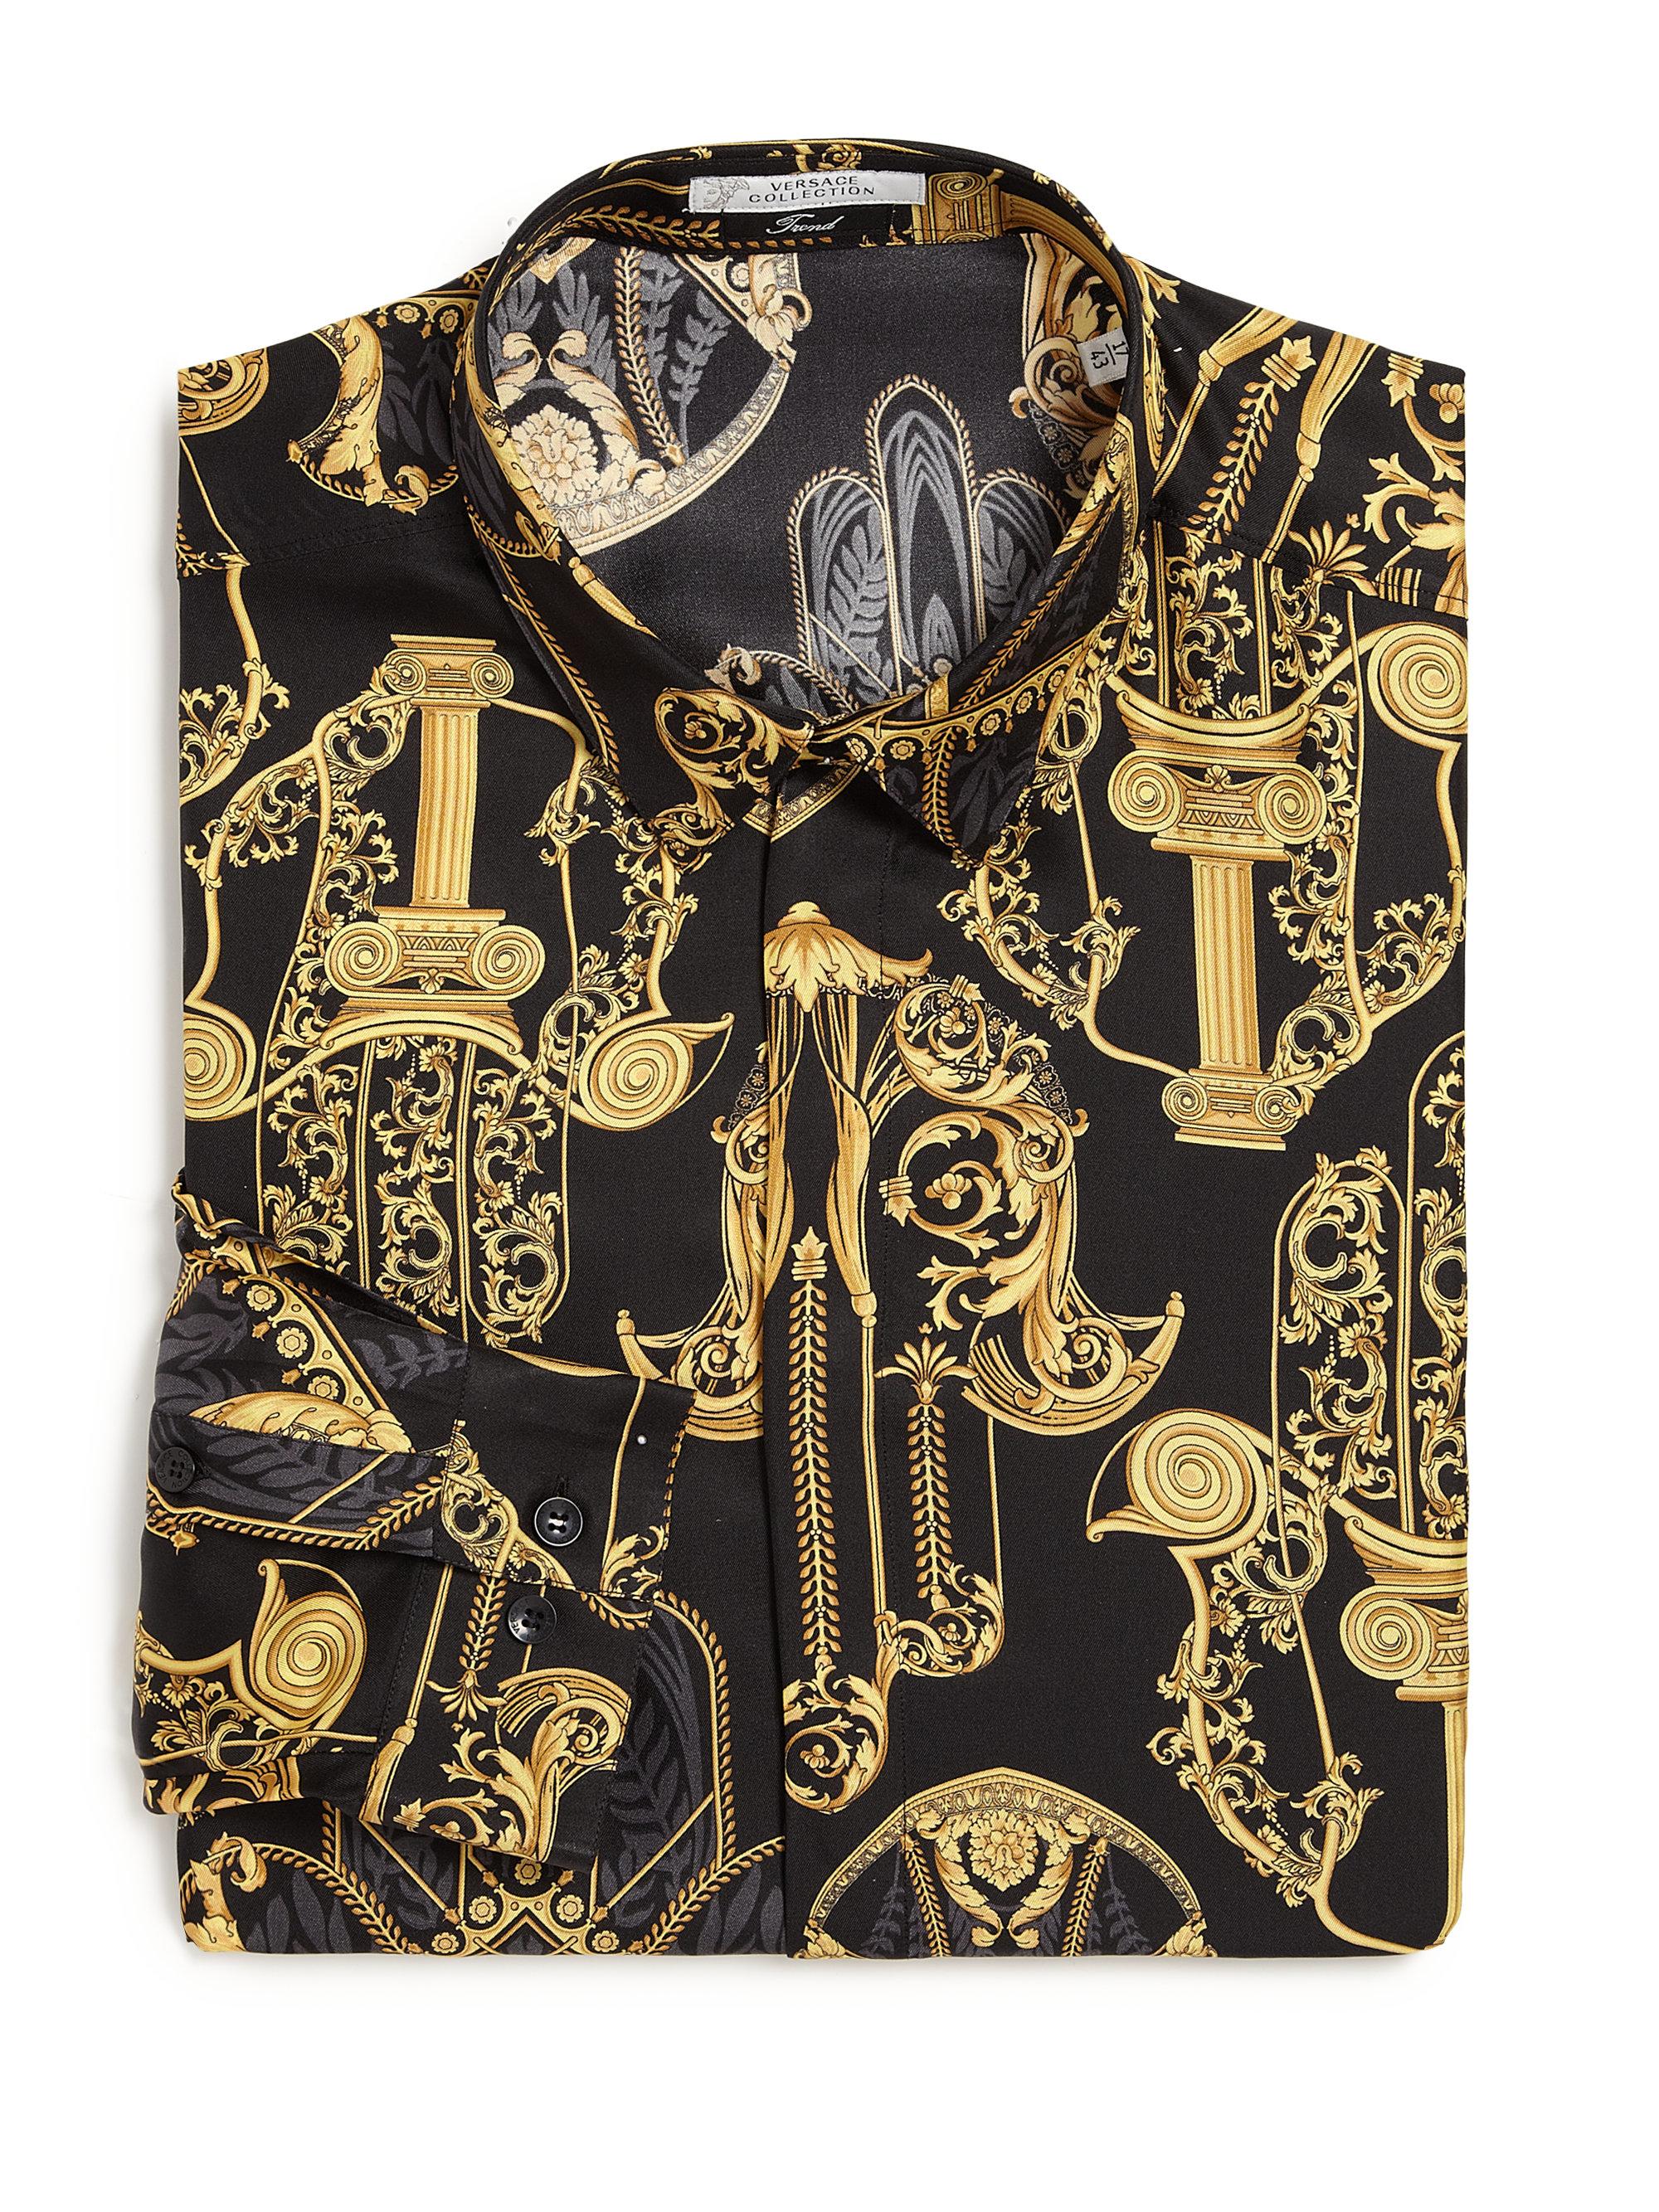 b3a696dae566c9 Lyst - Versace Baroque Print Silk Shirt in Metallic for Men